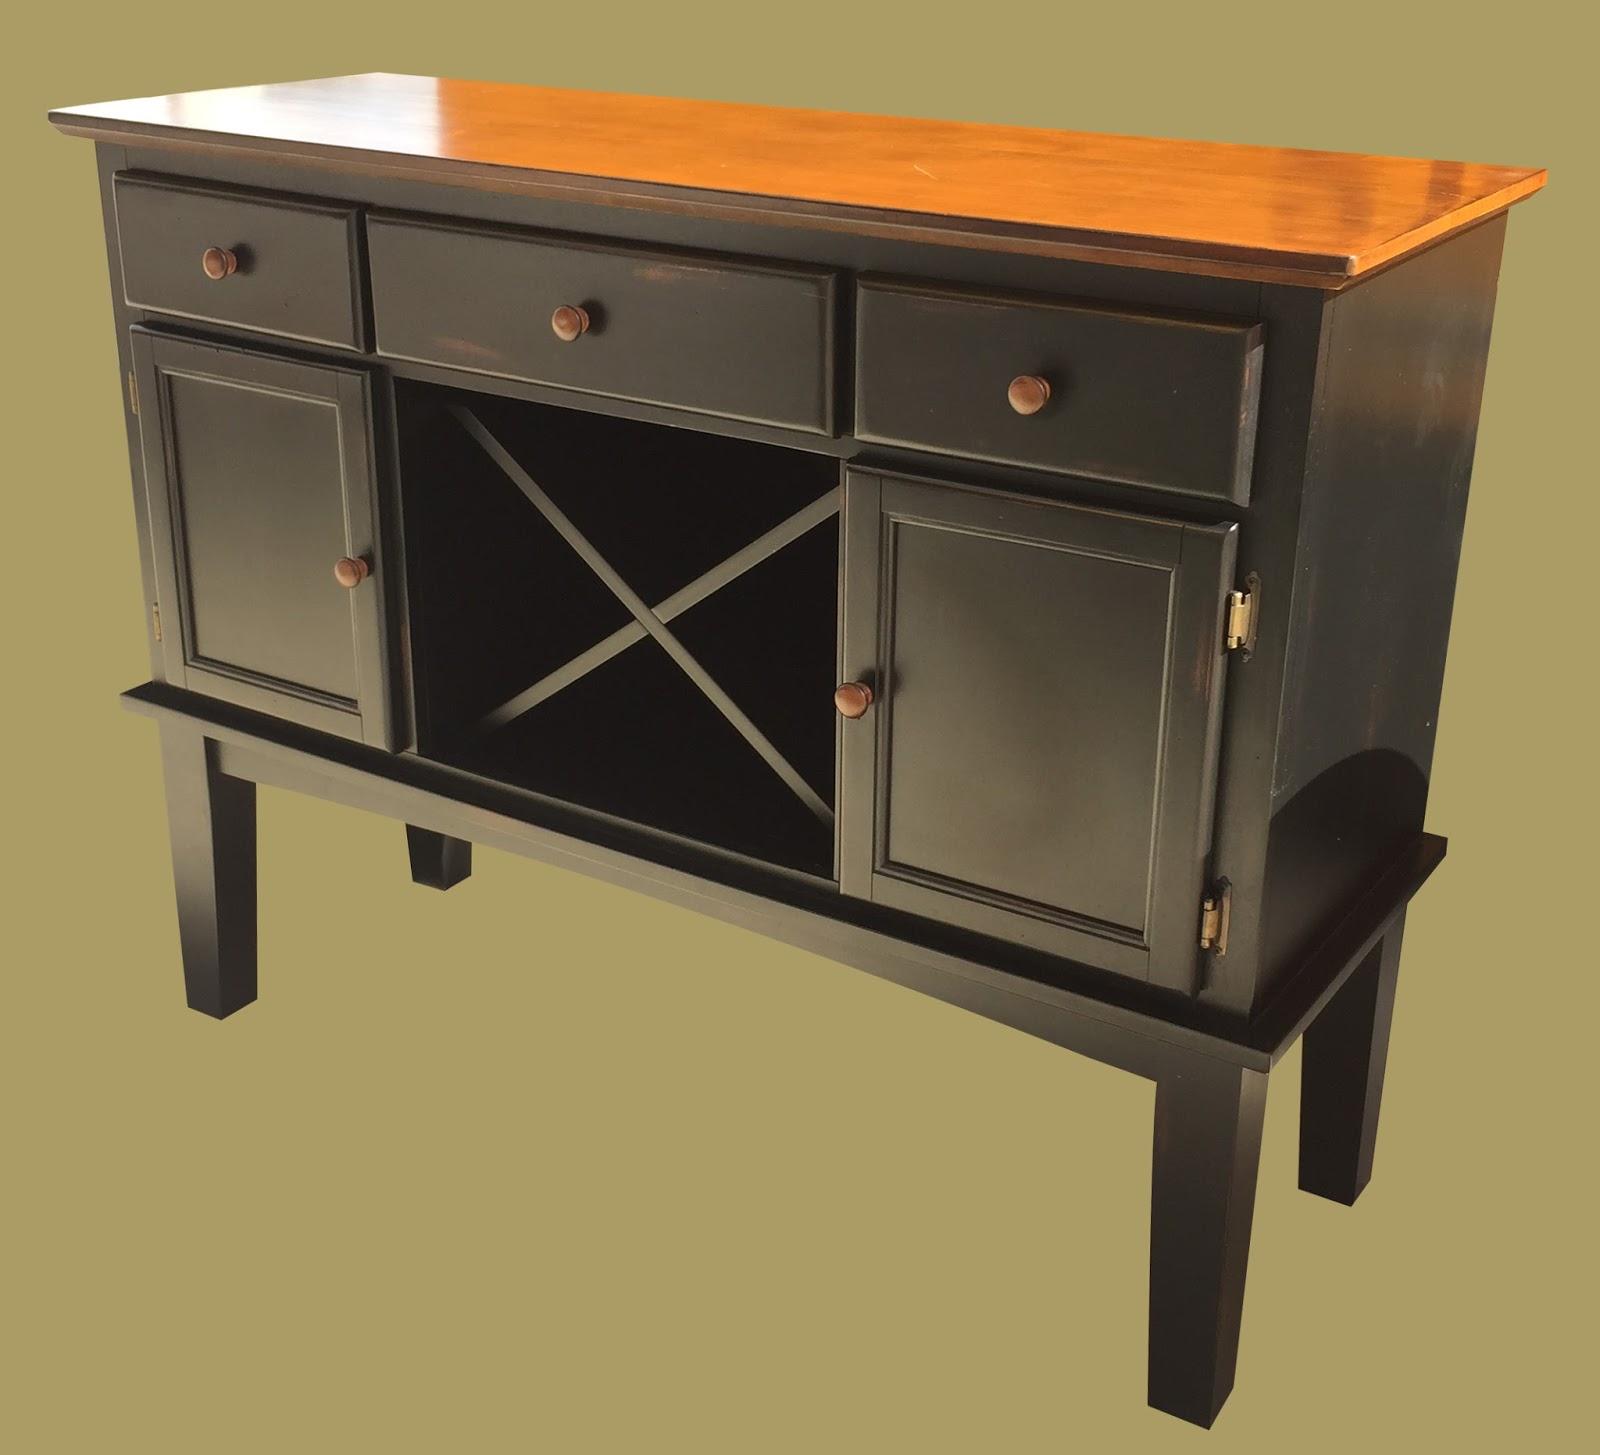 uhuru furniture collectibles bar buffet 175 sold. Black Bedroom Furniture Sets. Home Design Ideas